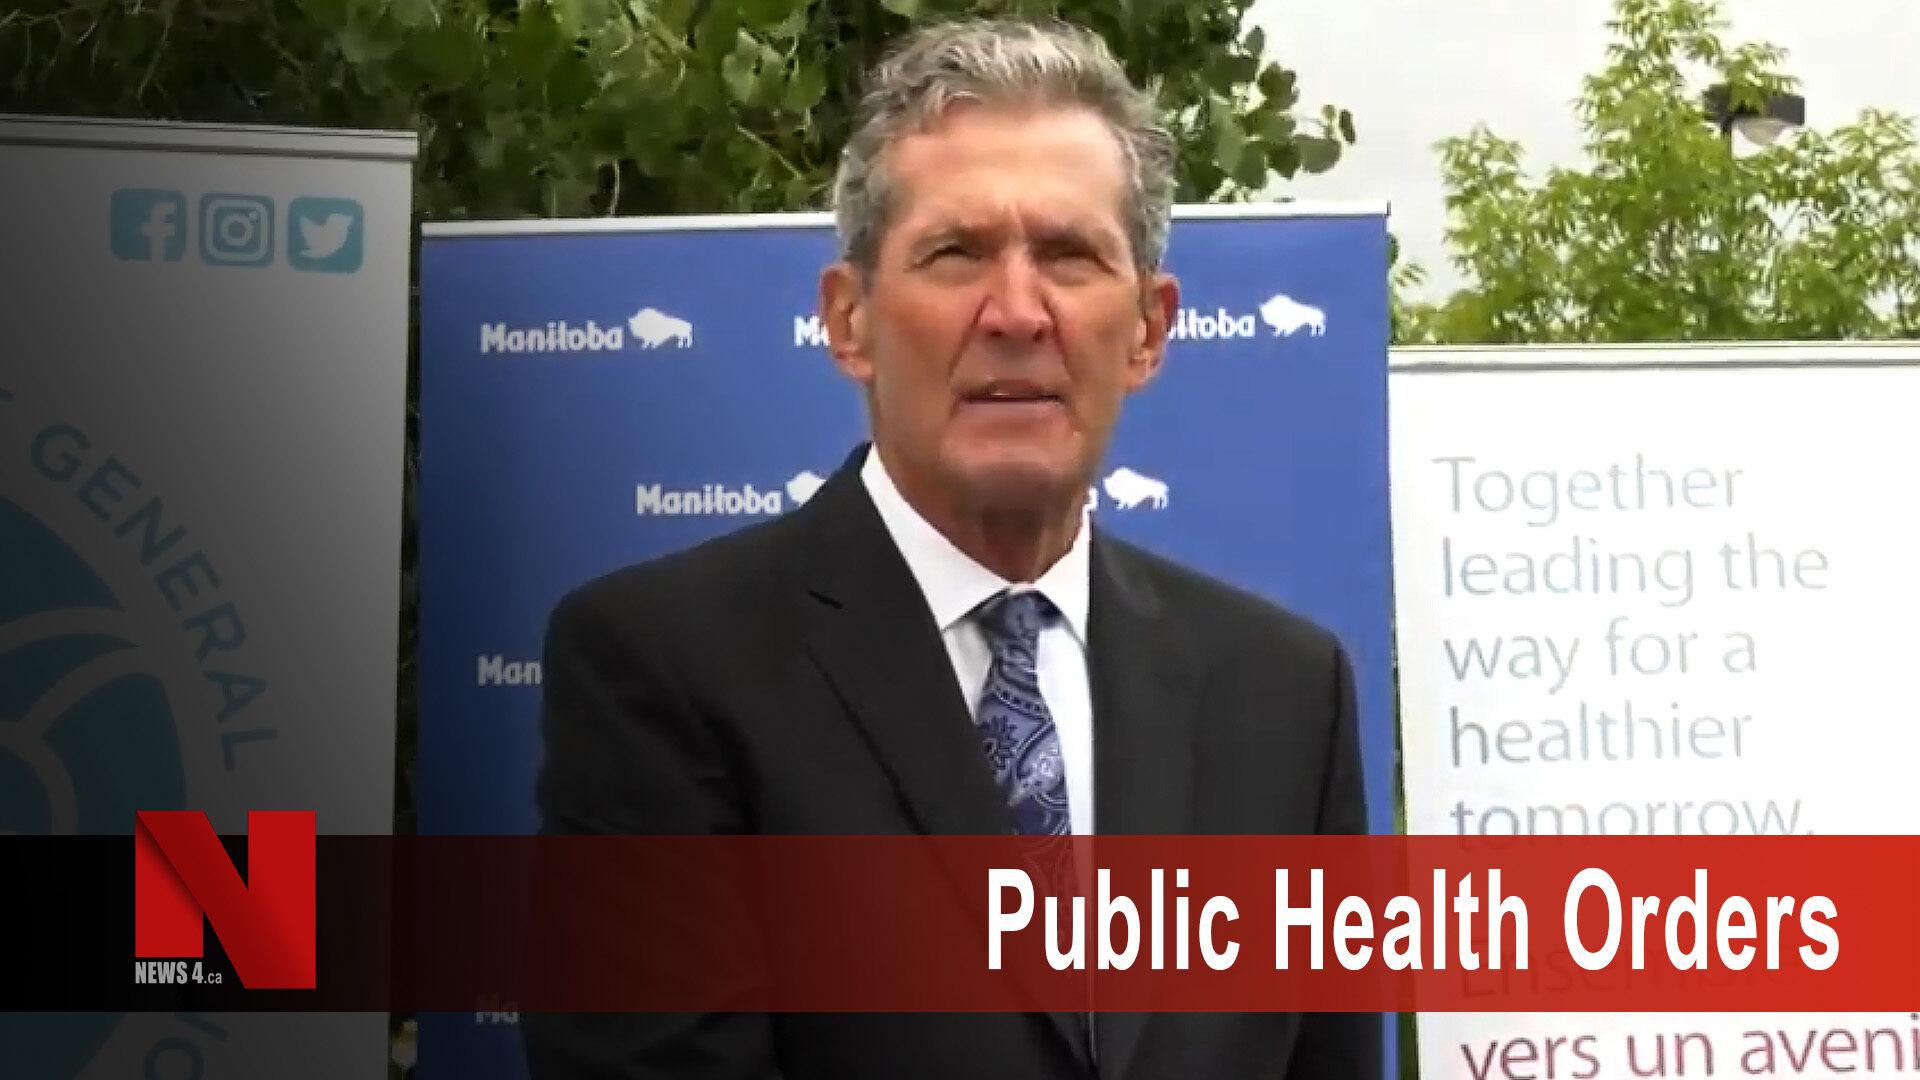 Public health orders